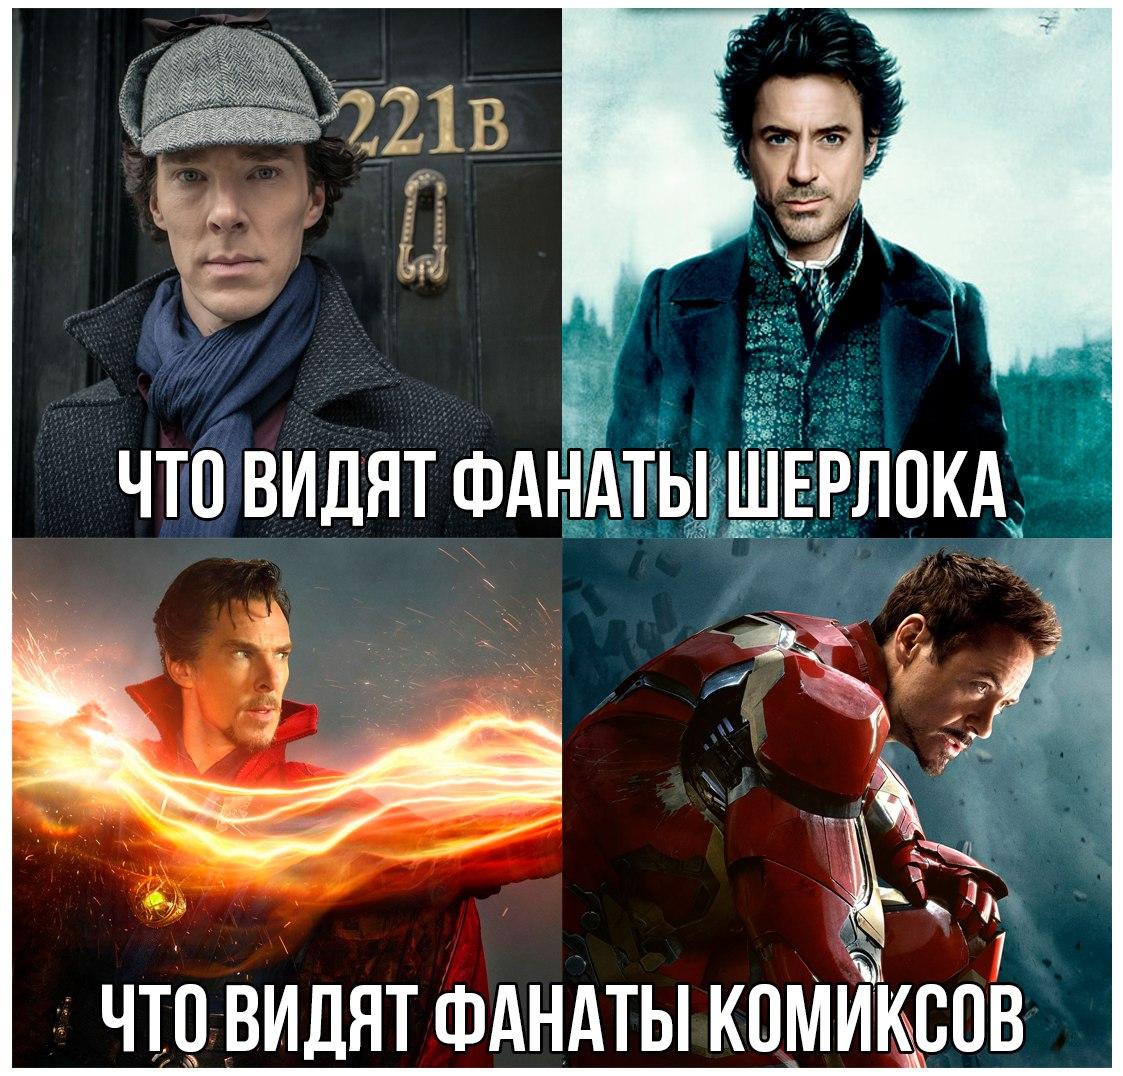 http://s4.uploads.ru/w21vu.jpg